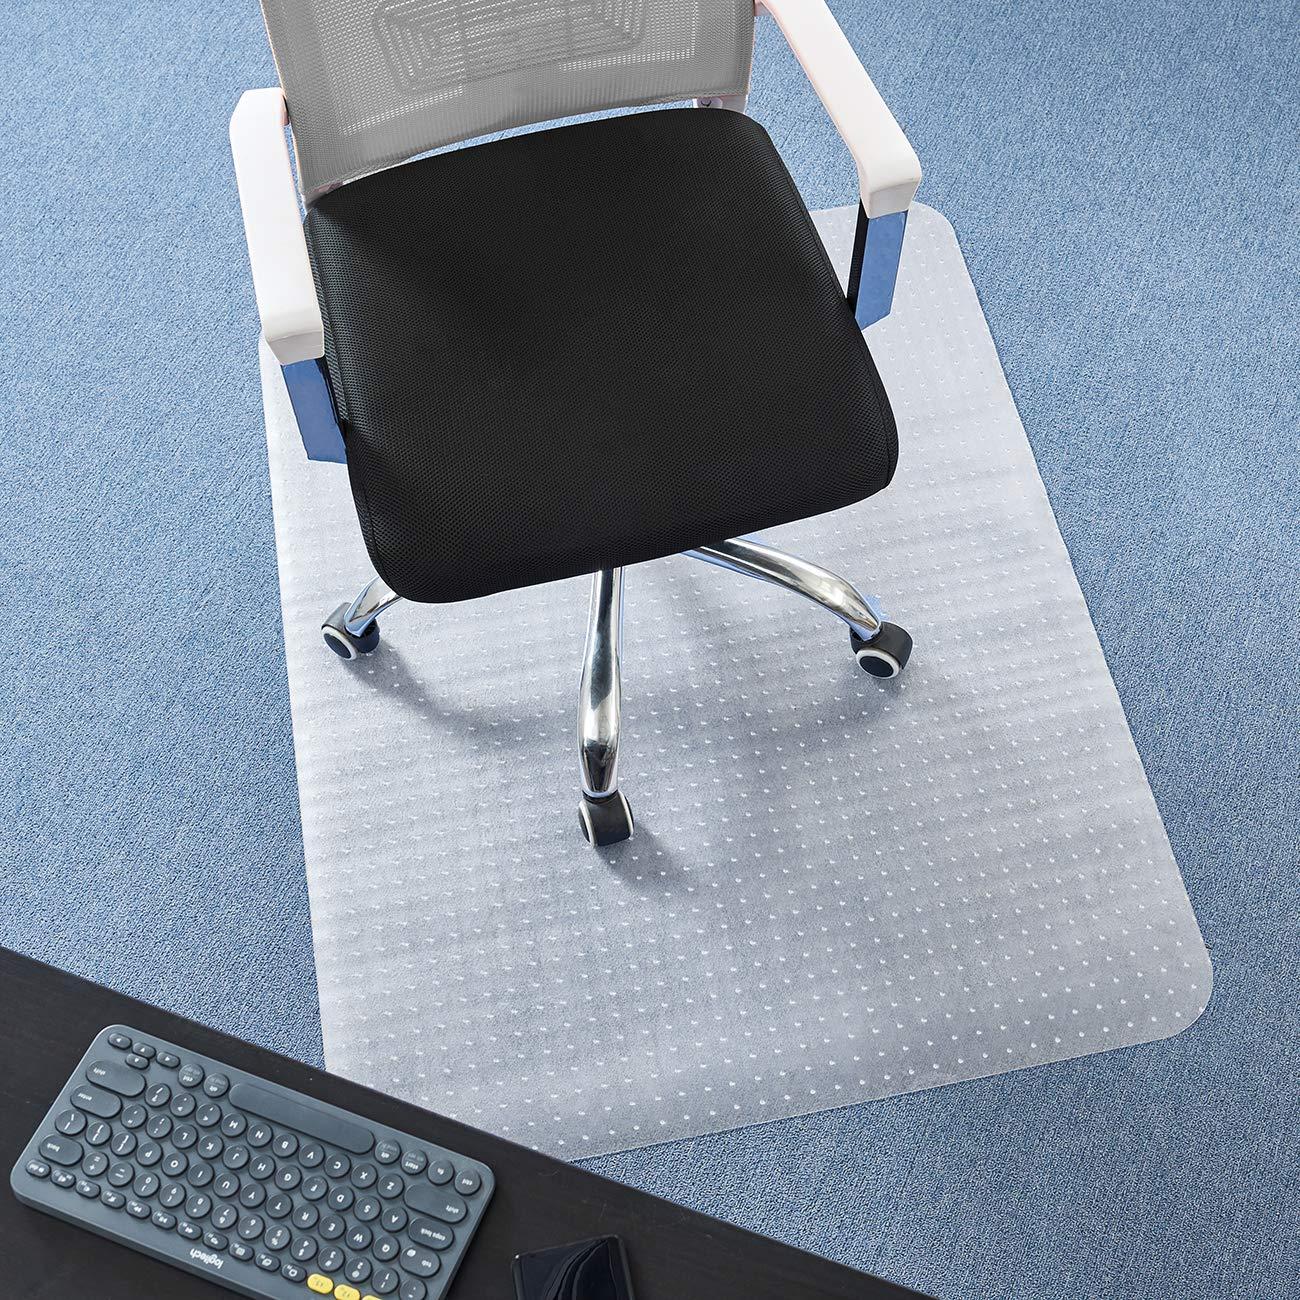 DAVID.ANN 36'' x 48'' Vinyl (PVC) Rectangular Chair Mat for Very Low Pile Carpets (Transparent) by DAVID.ANN